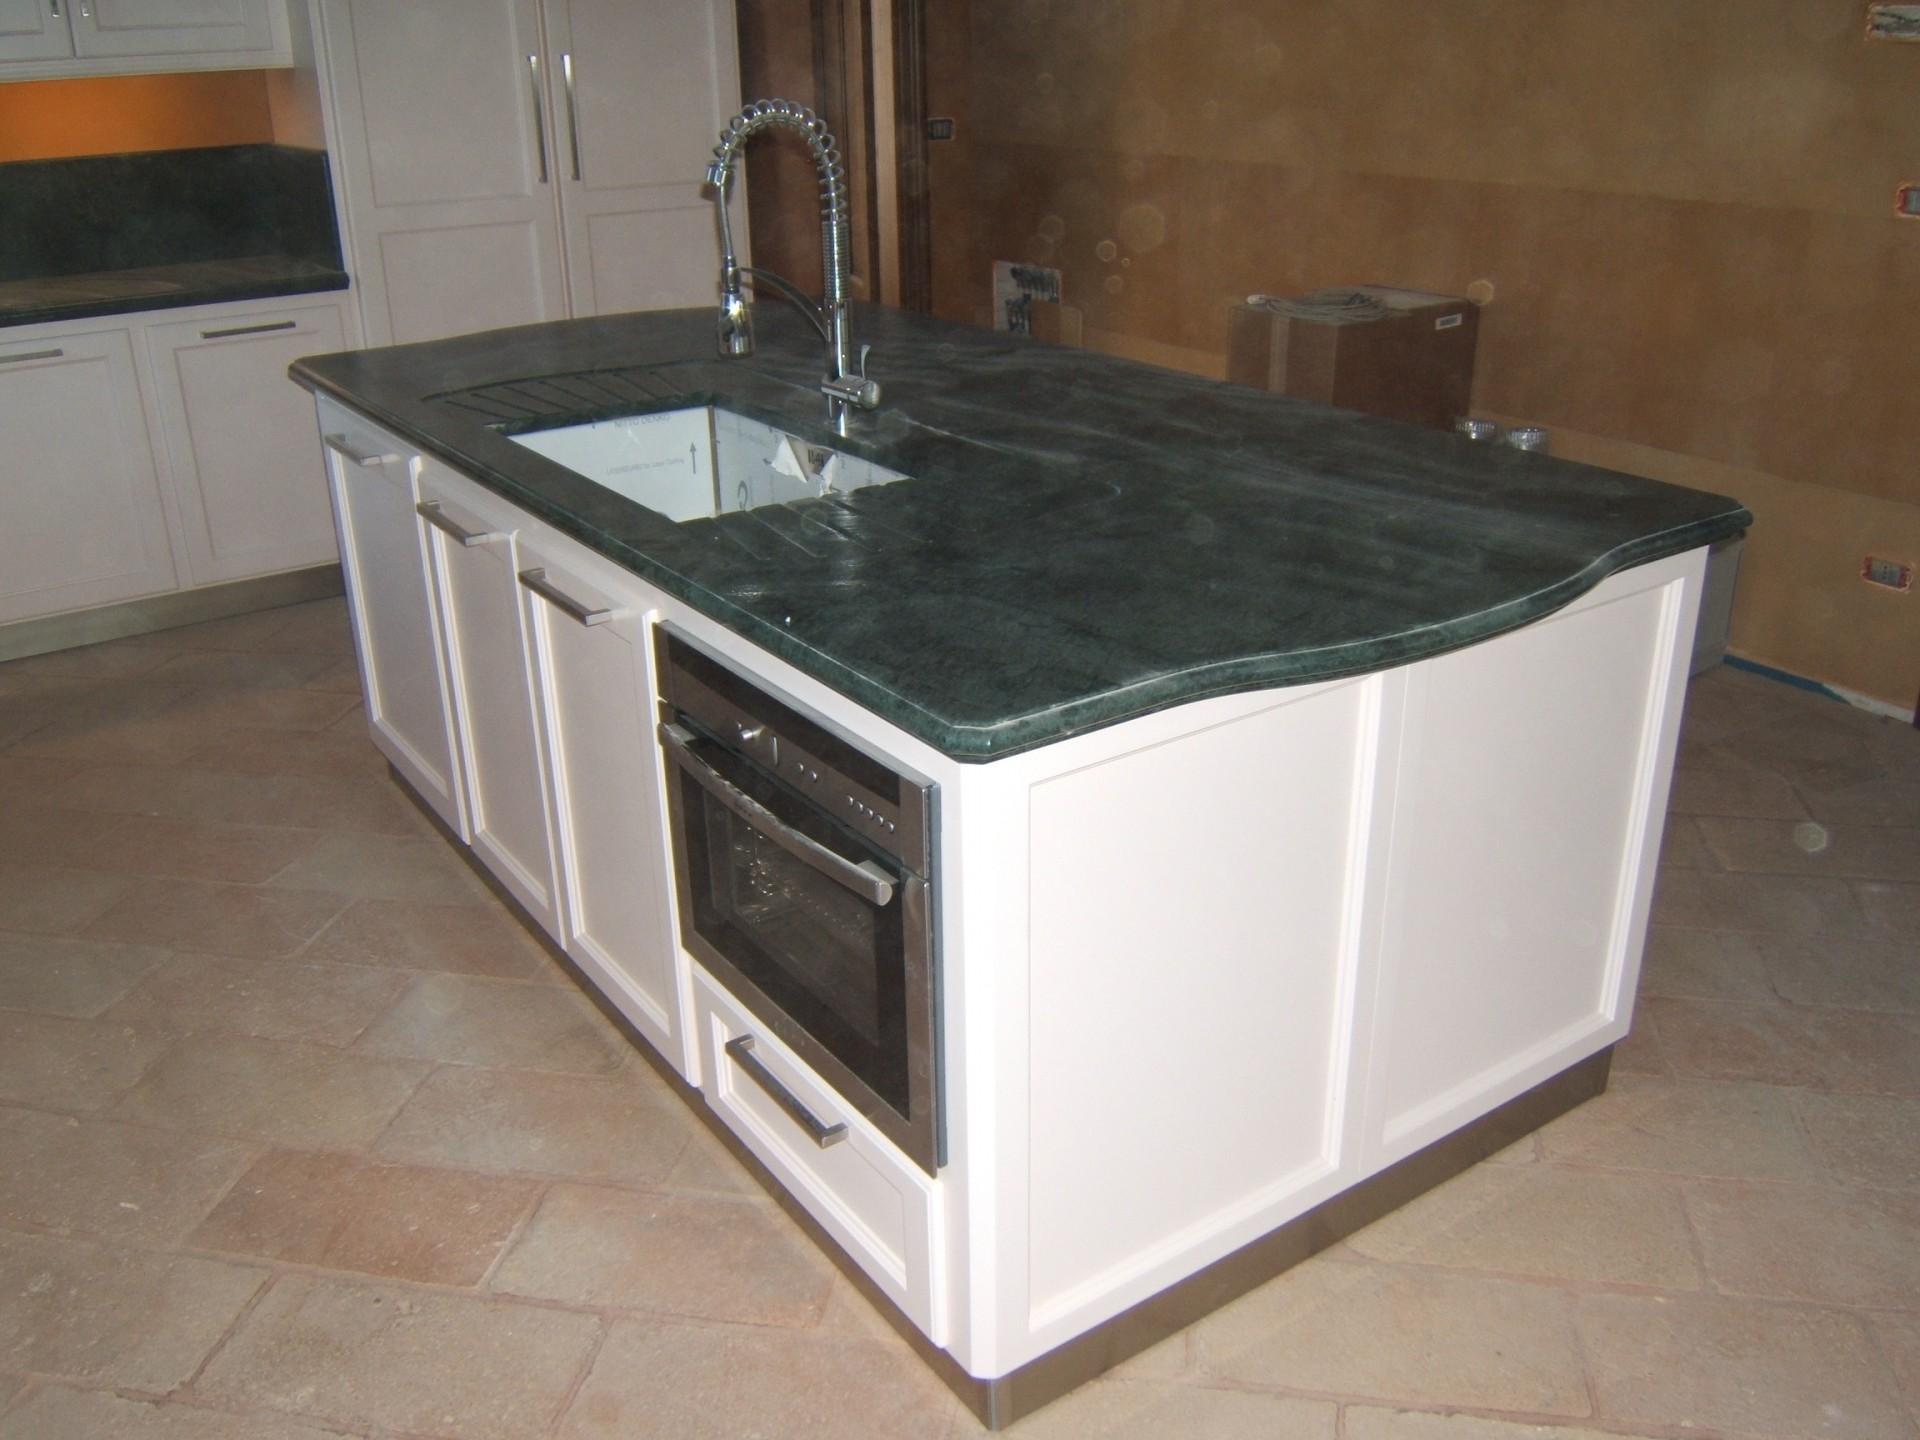 Best Mobile Isola Per Cucina Images - Acomo.us - acomo.us